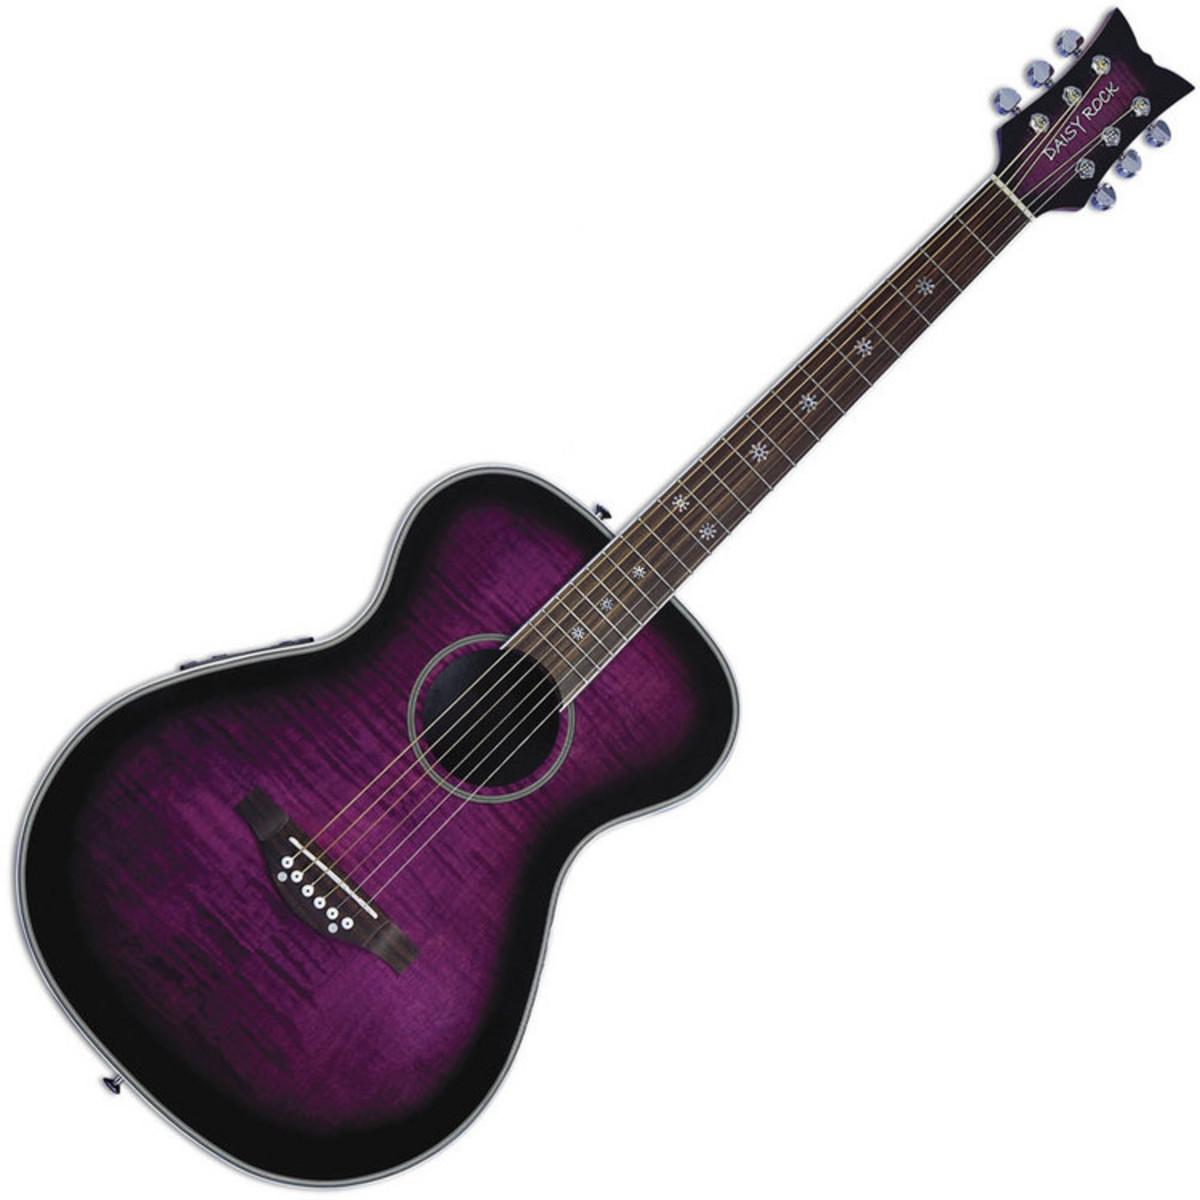 Afinador electronico de guitarra acoustica online dating 4